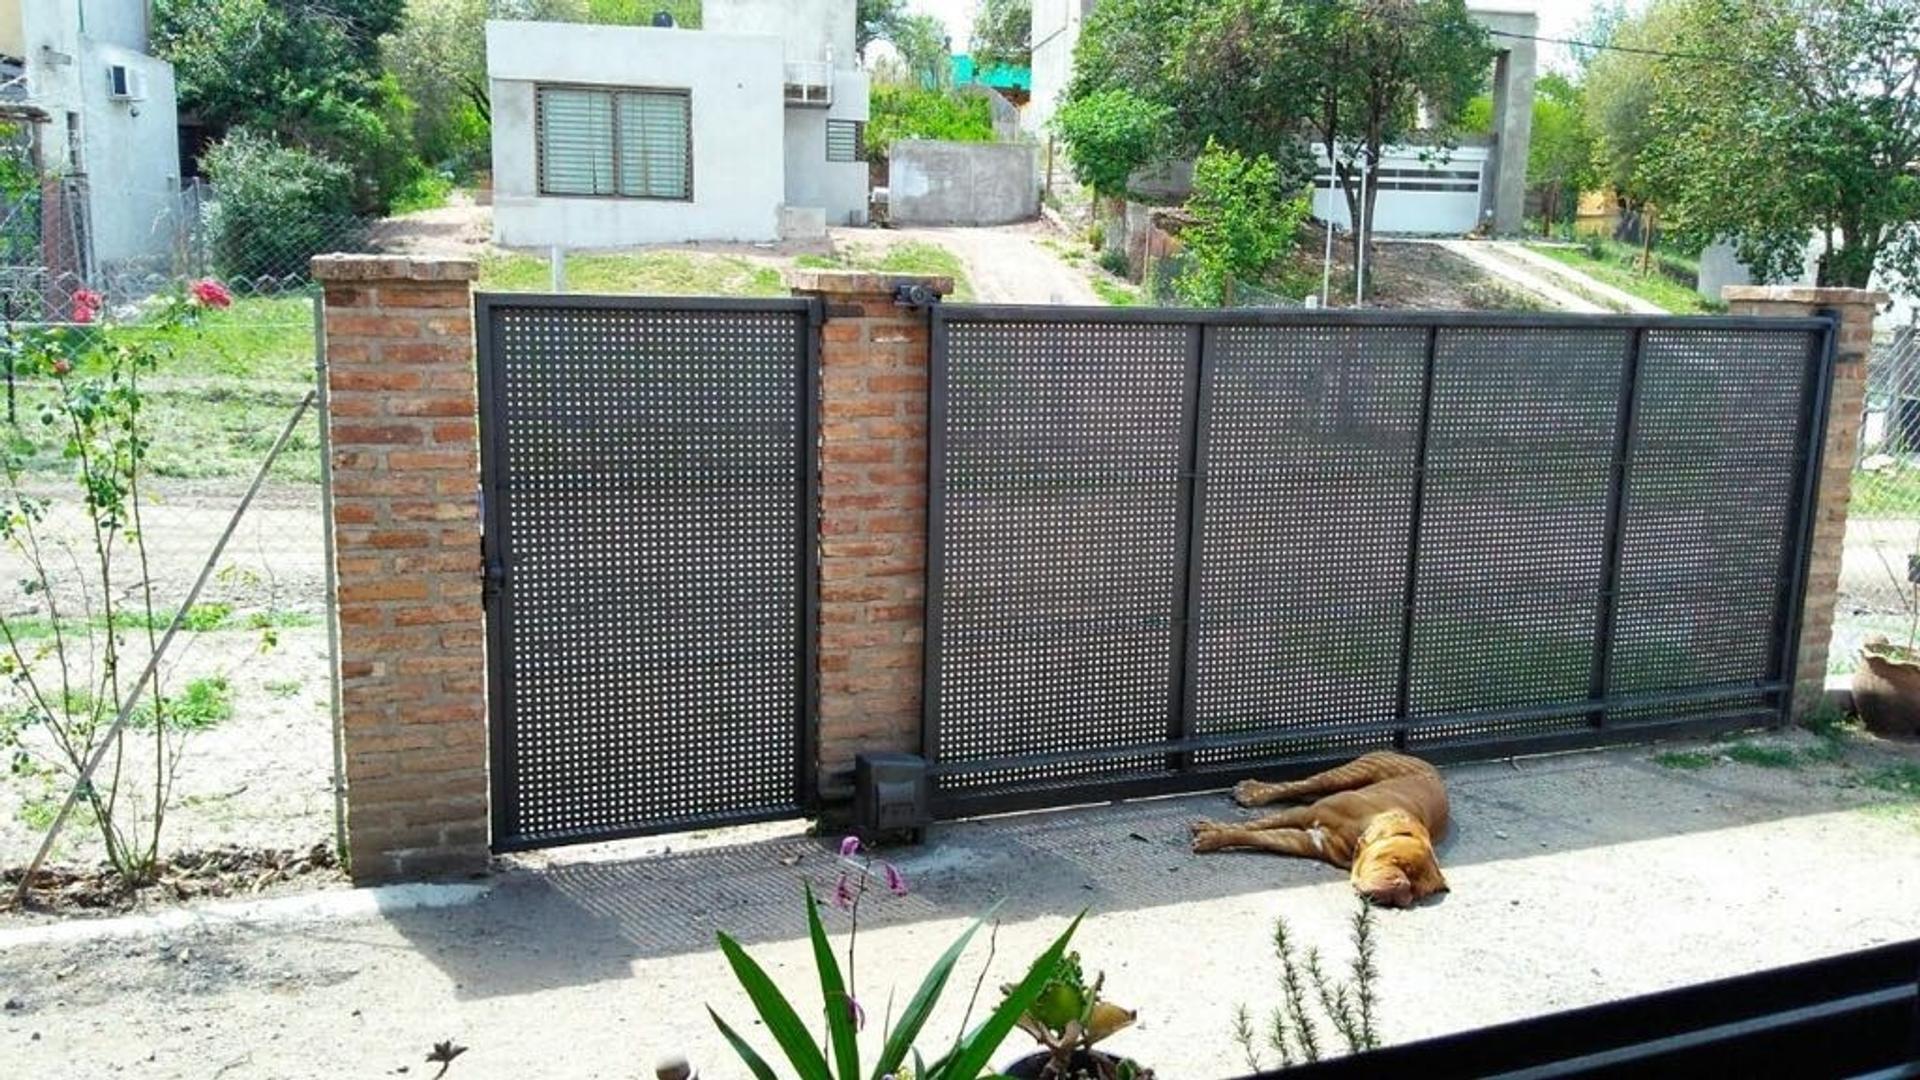 SE VENDE CASA EN MENDIOLAZA, GRAN CALIDAD CONSTRUCTIVA